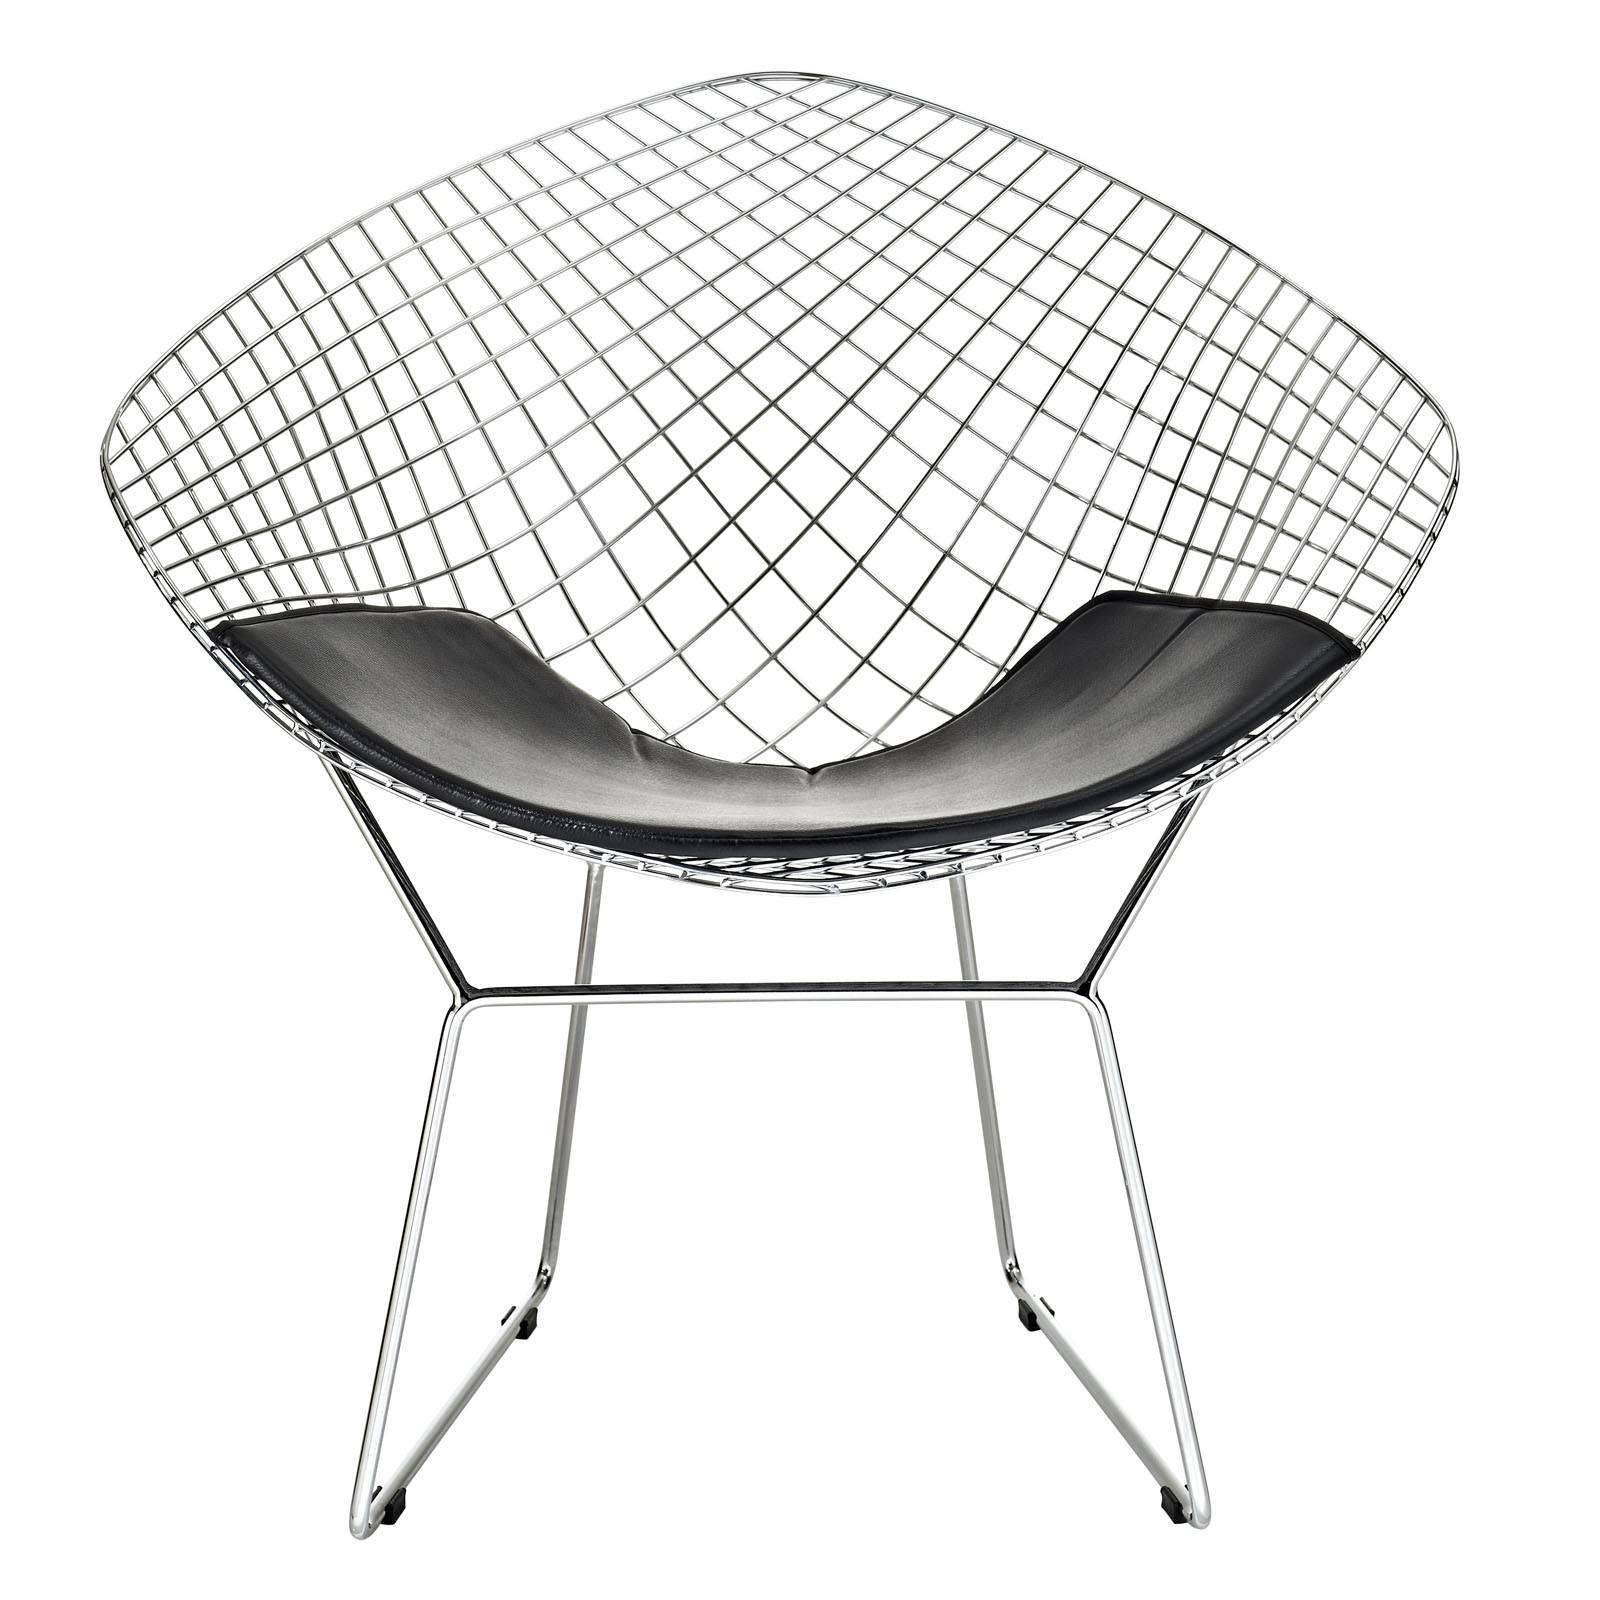 bertoia style chair double folding with umbrella diamond wire